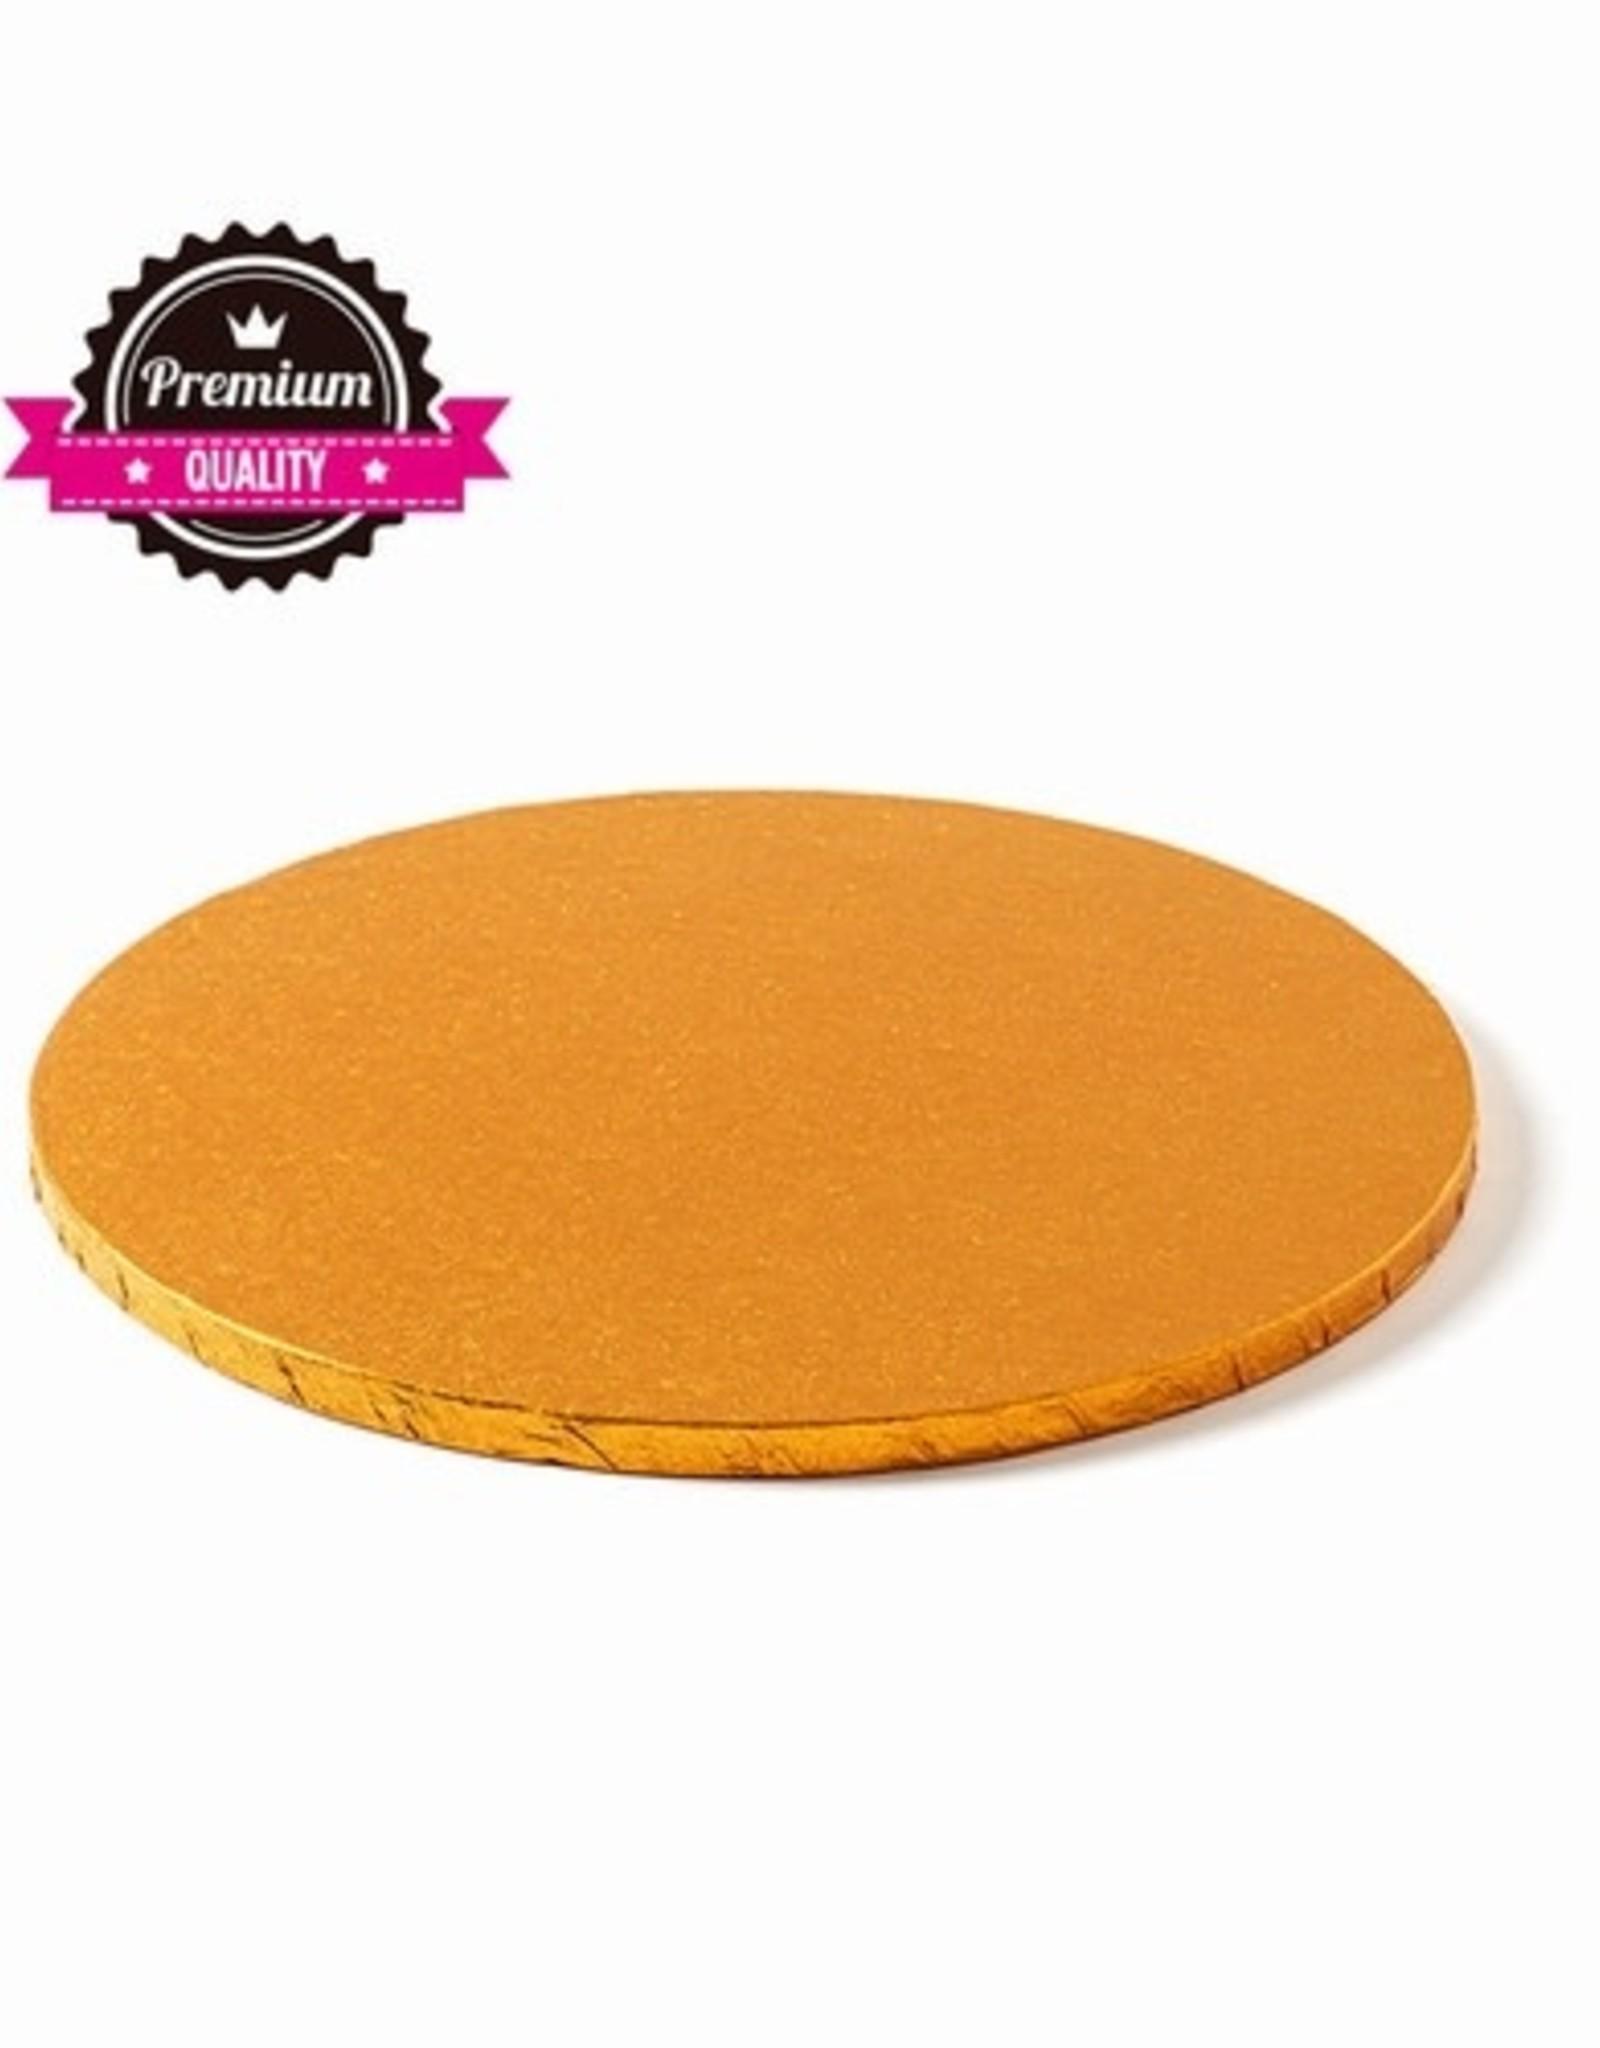 Cake Drum Rond Ø25cm Oranje